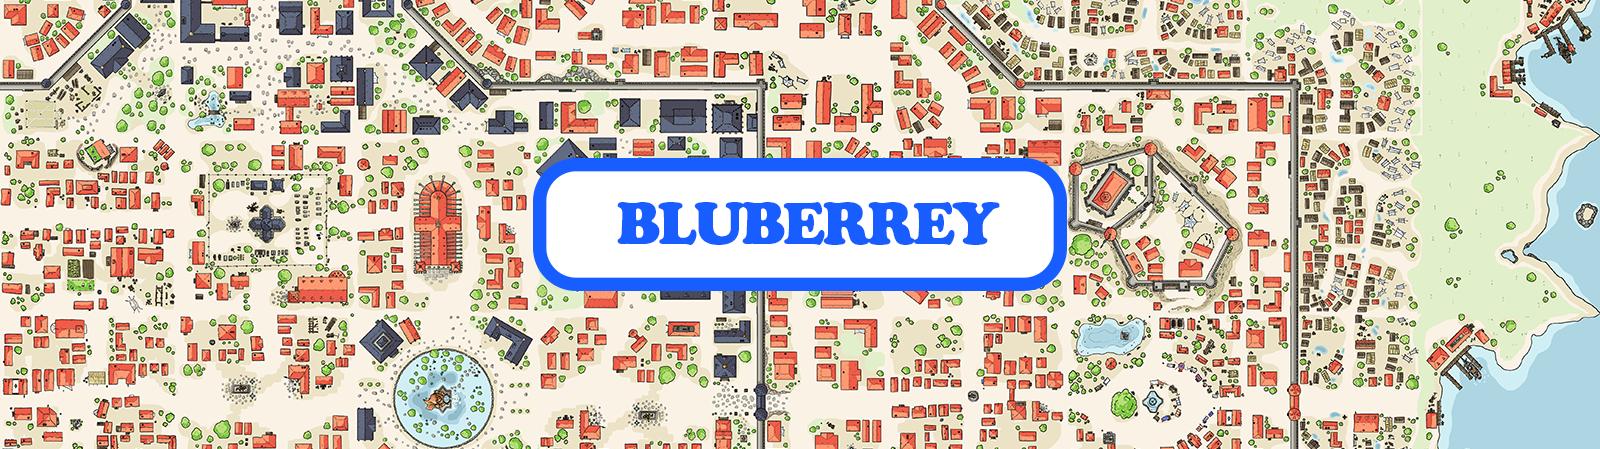 BluBerrey